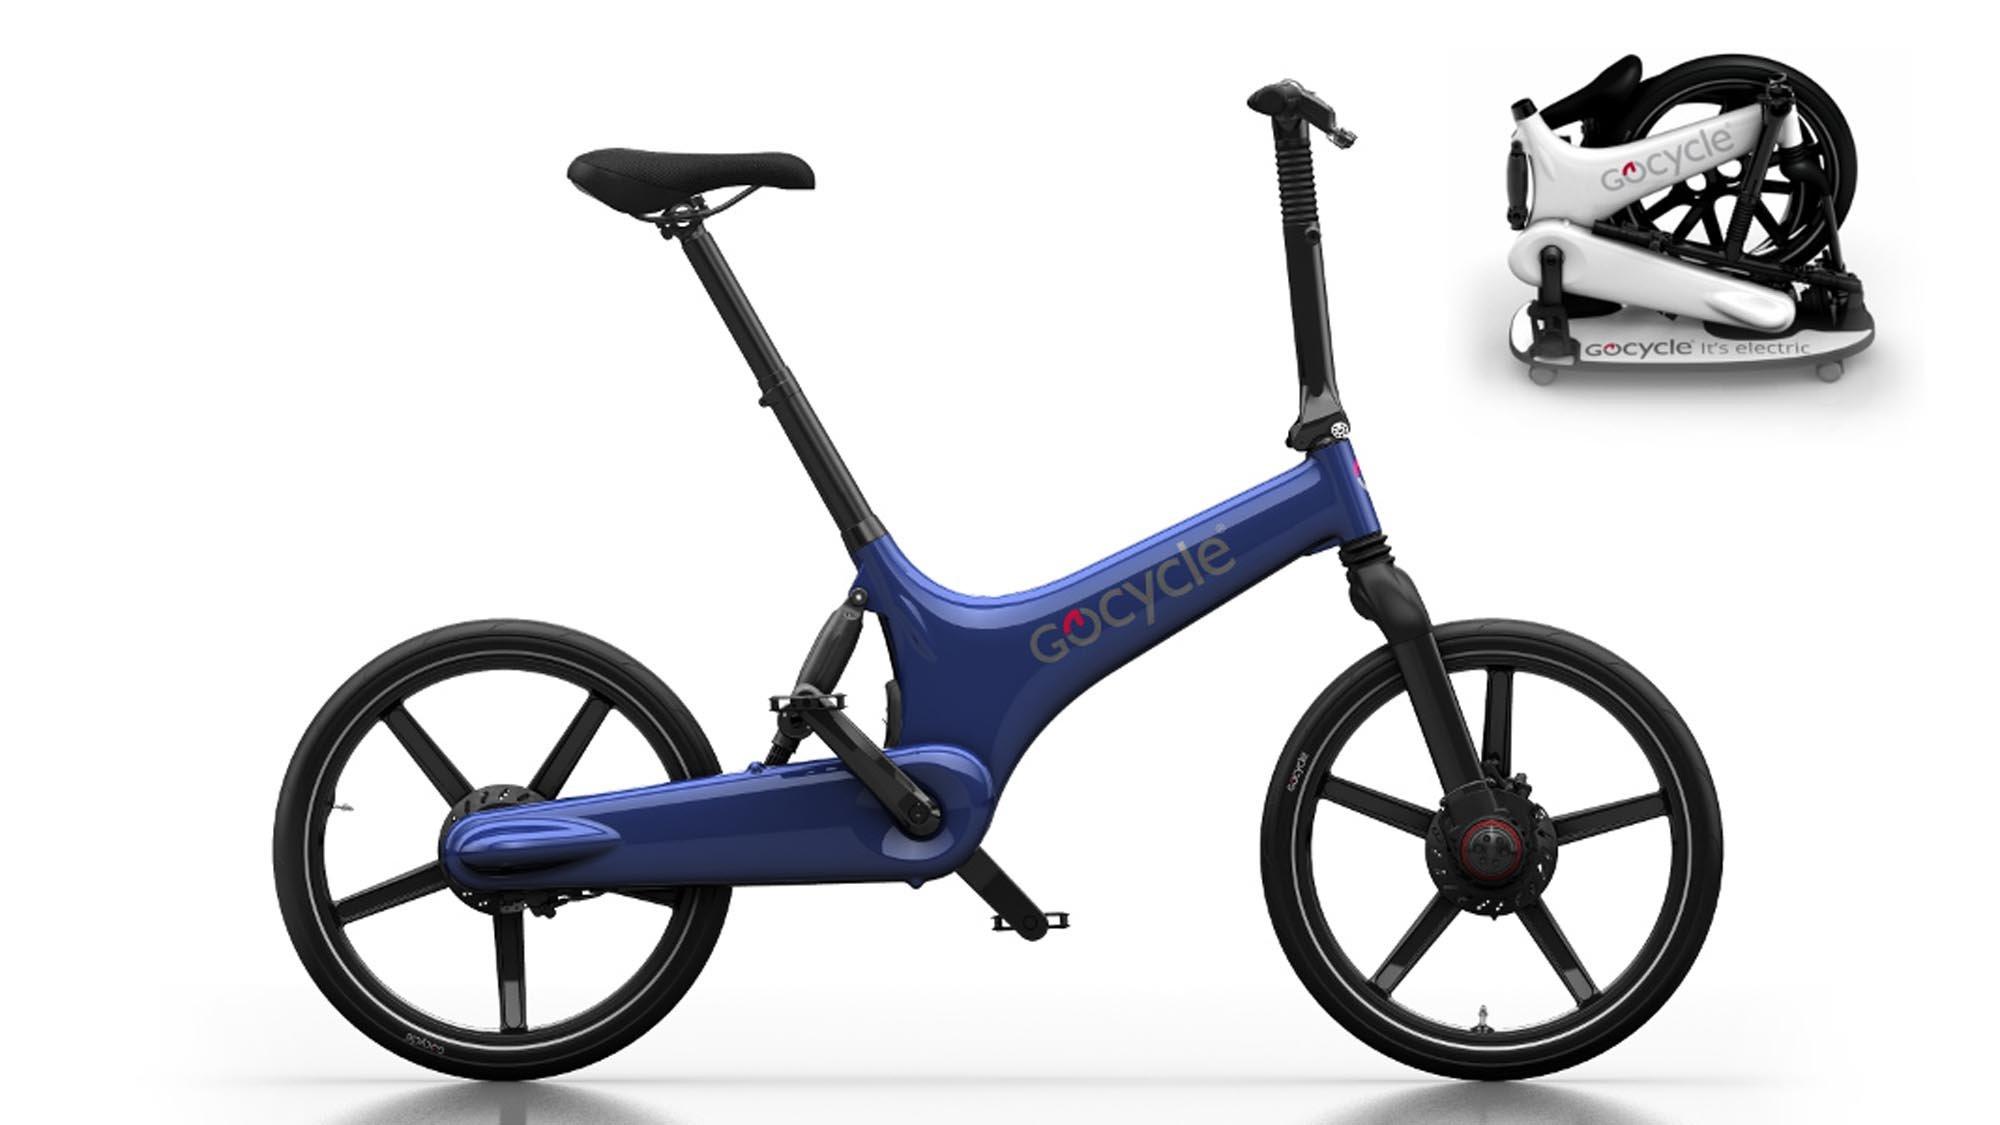 Best Electric Bike 2018 The Best Commuting Folding Mtb